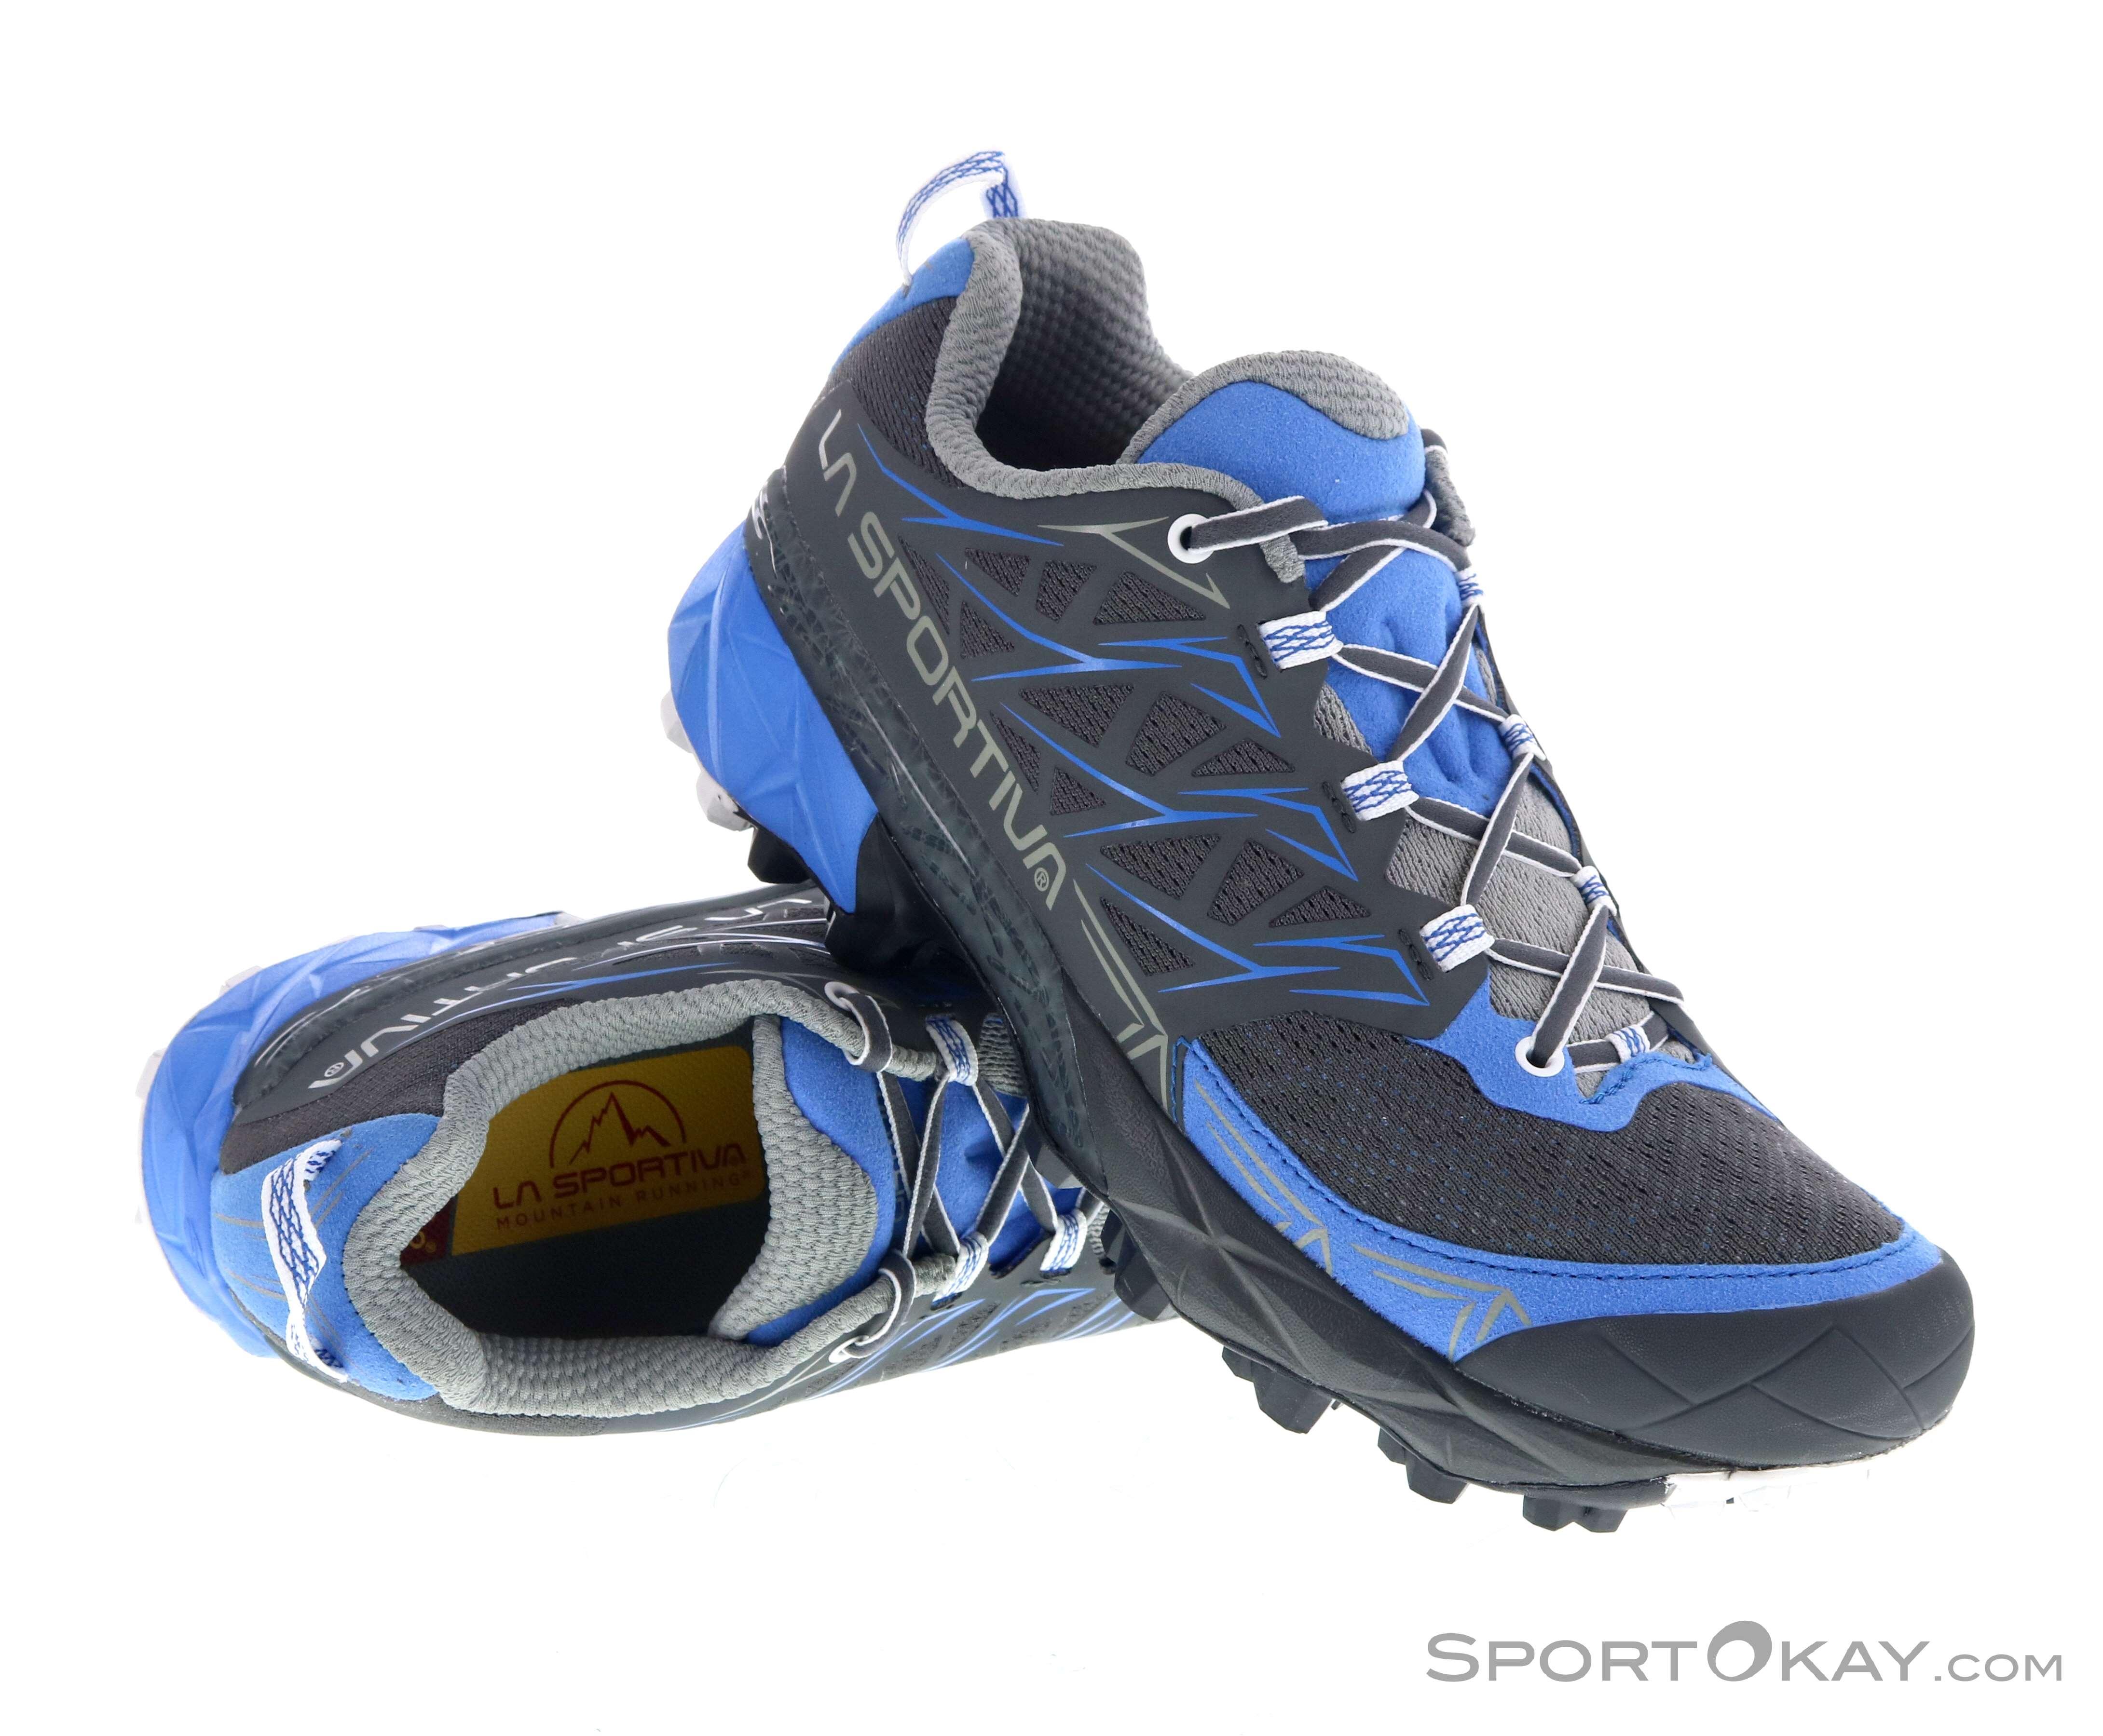 La Sportiva La Sportiva Akyra Womens Trail Running Shoes